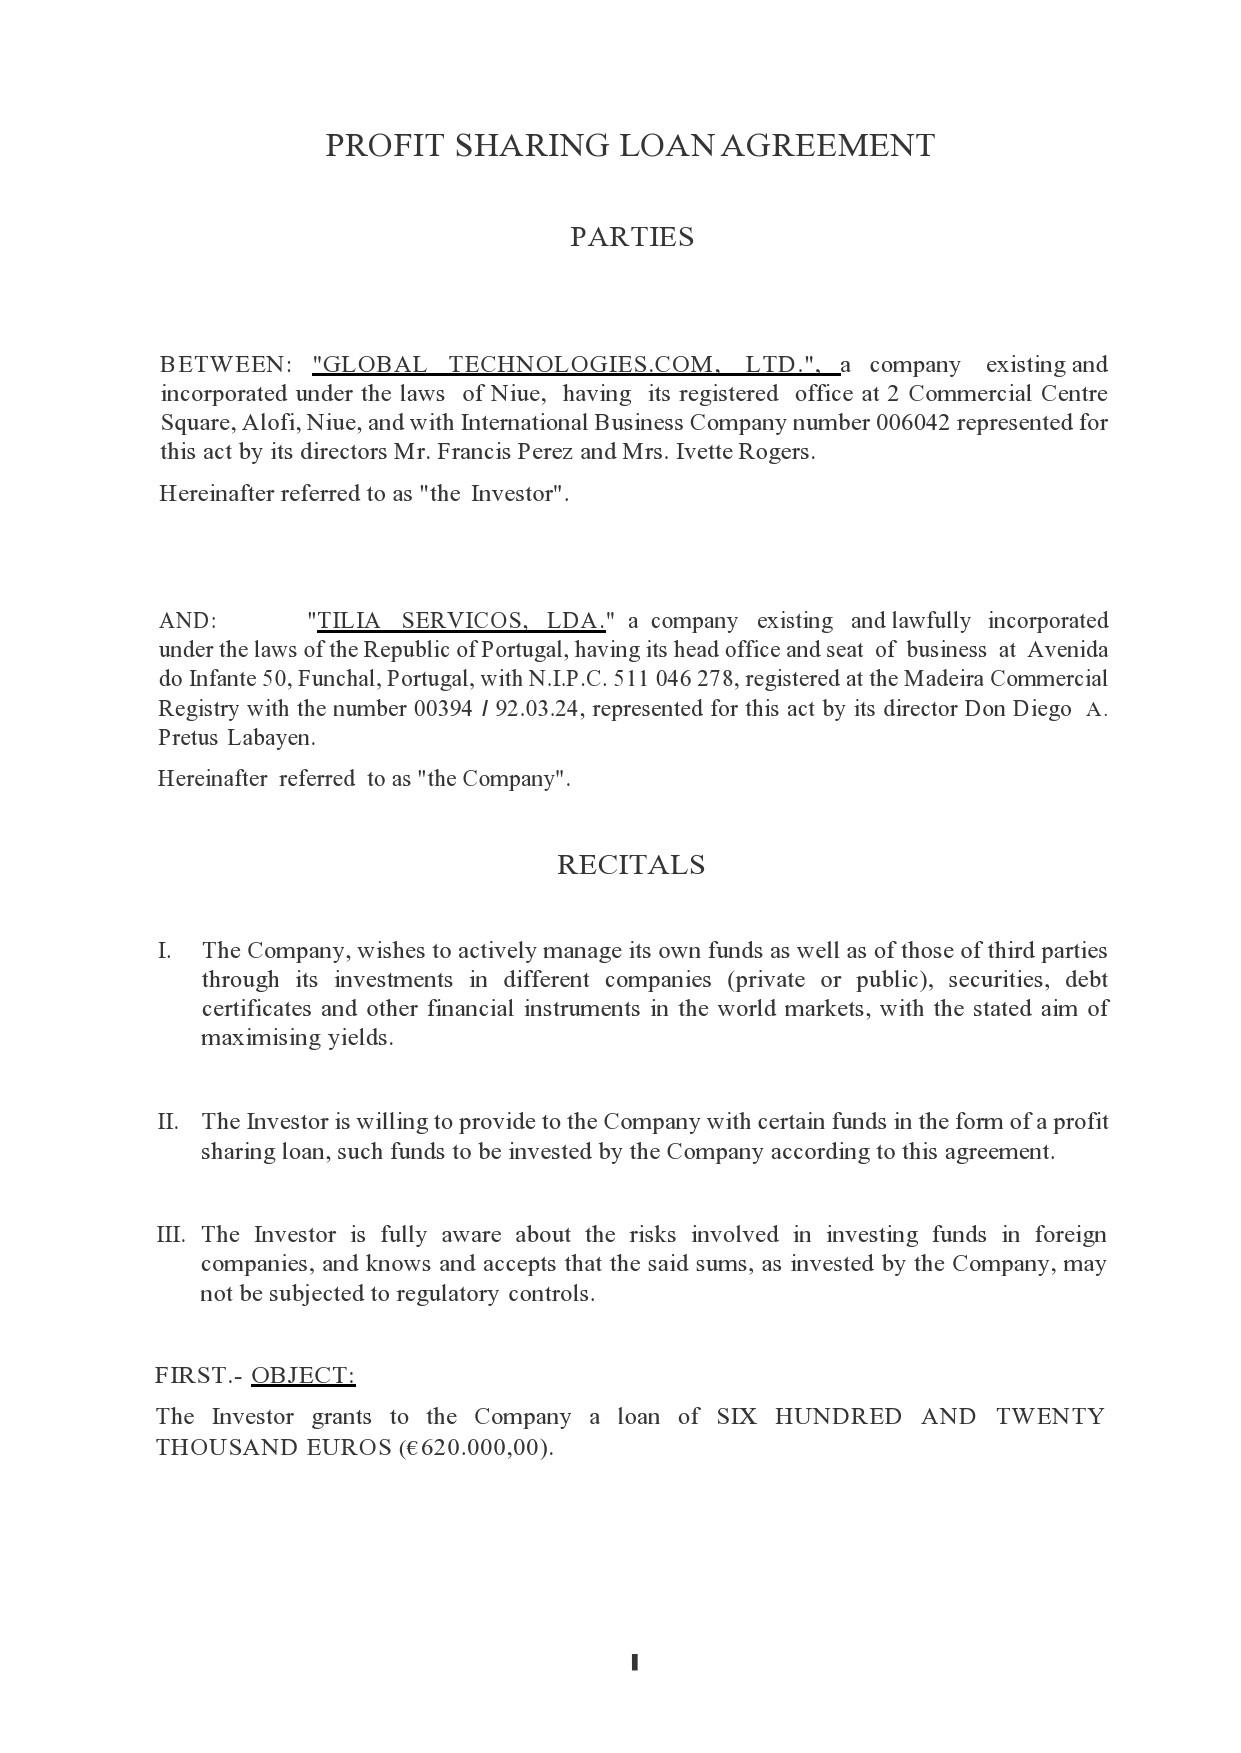 Free profit sharing agreement 04